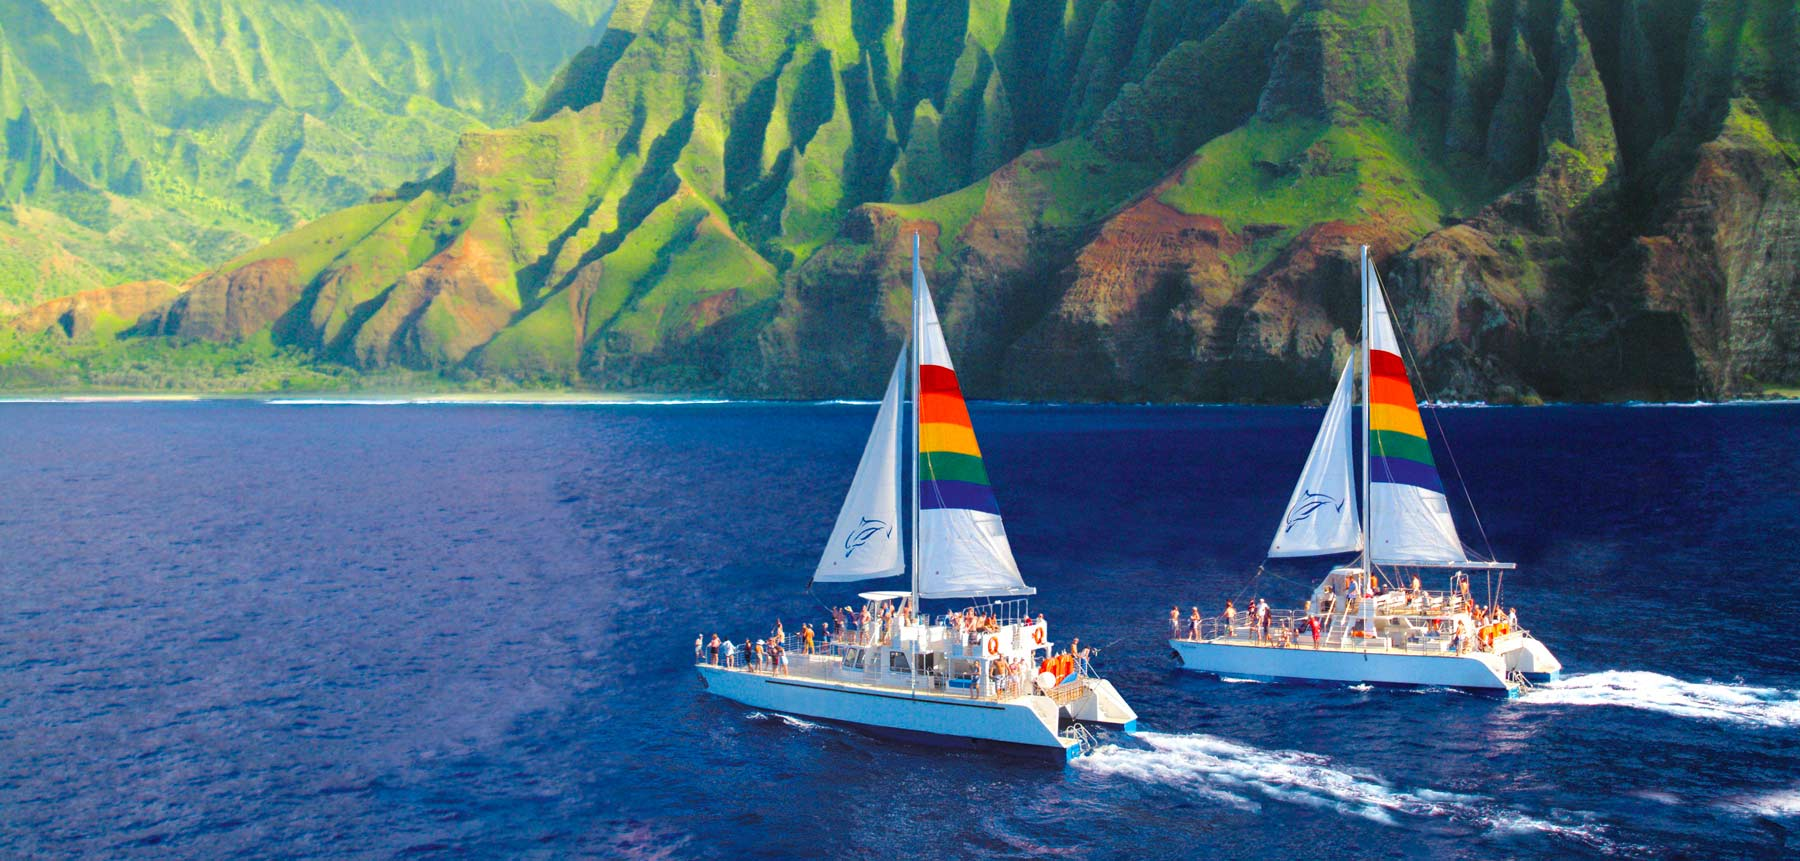 Sunset Boat Tours Kauai